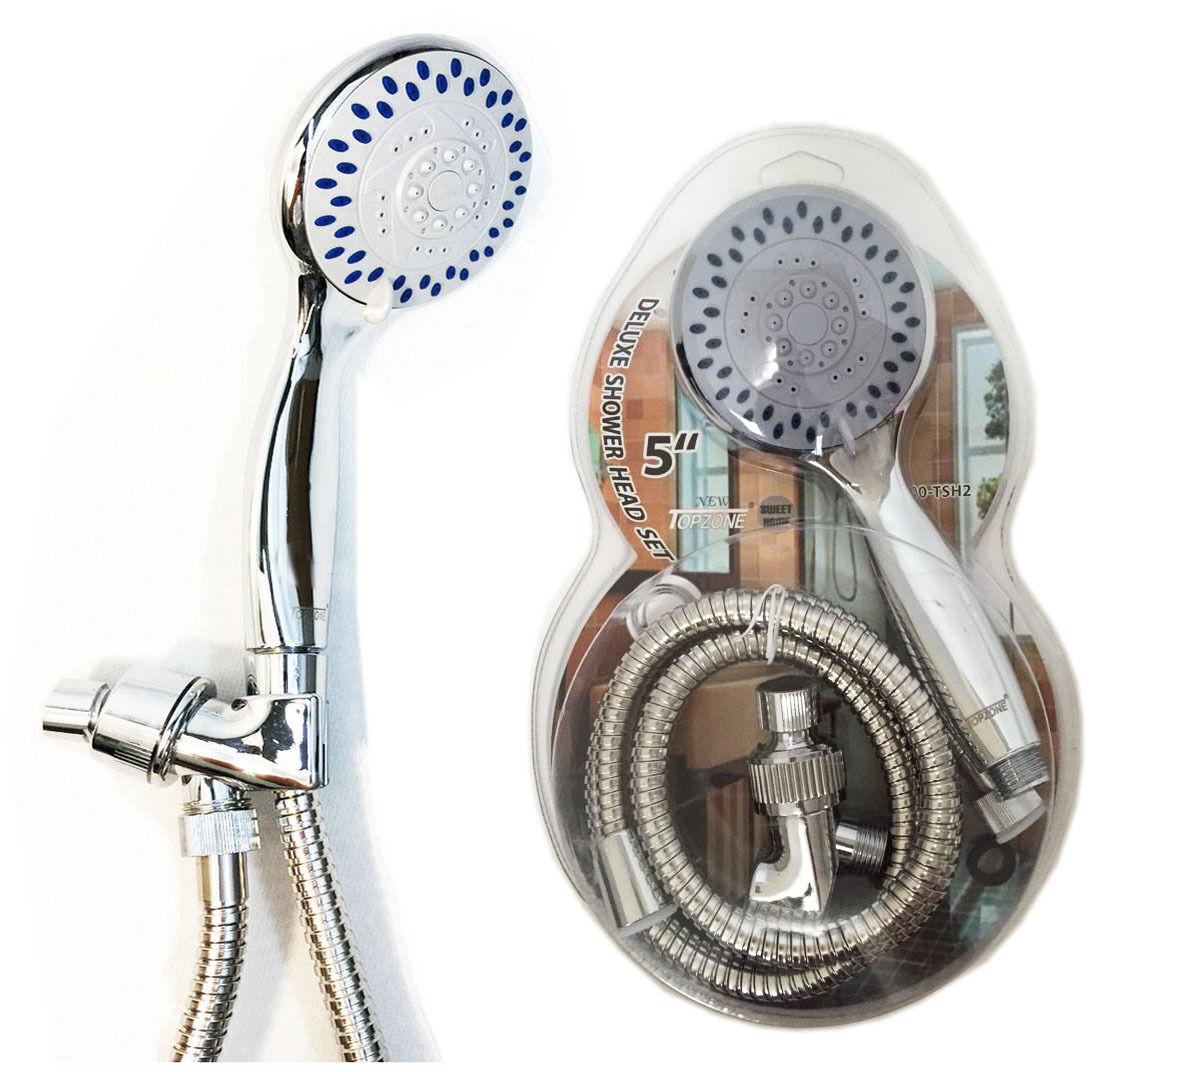 5 Way Water Saving Multi Function Bathroom Hand Held Shower Hose Head Chrome